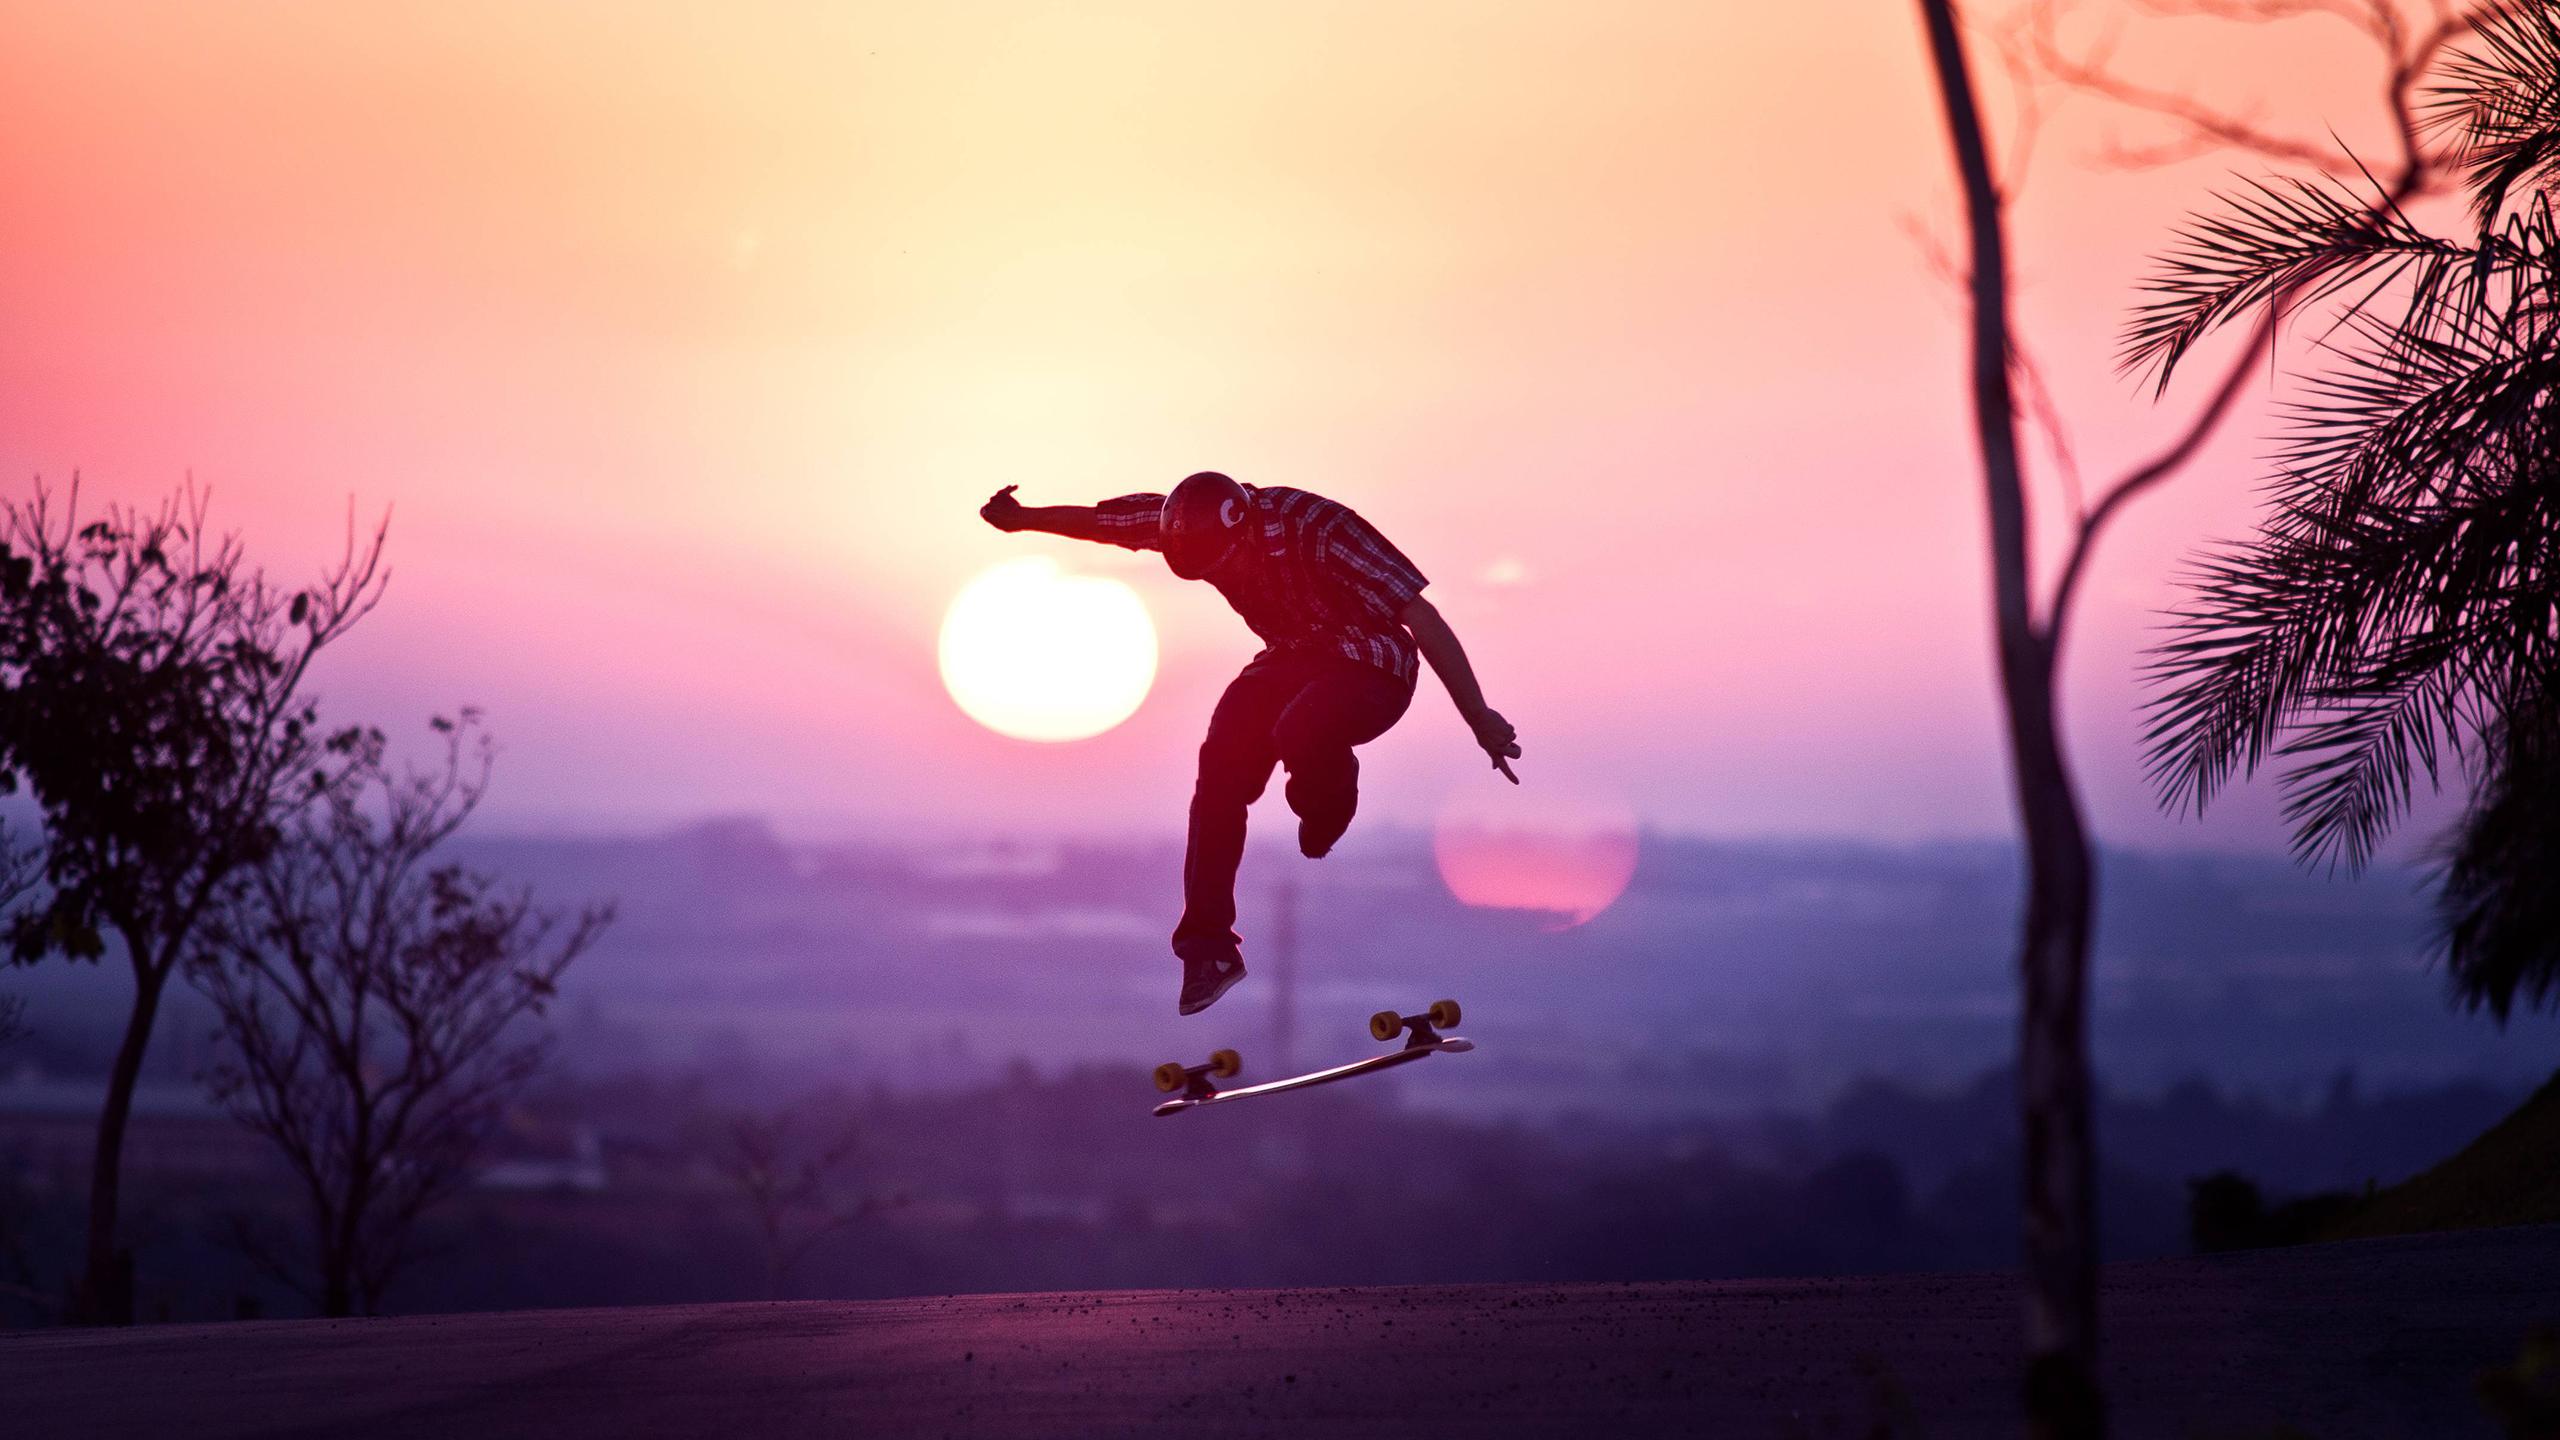 HD Wallpaper | Background Image ID:423562. 2560x1440 Sports Skateboarding